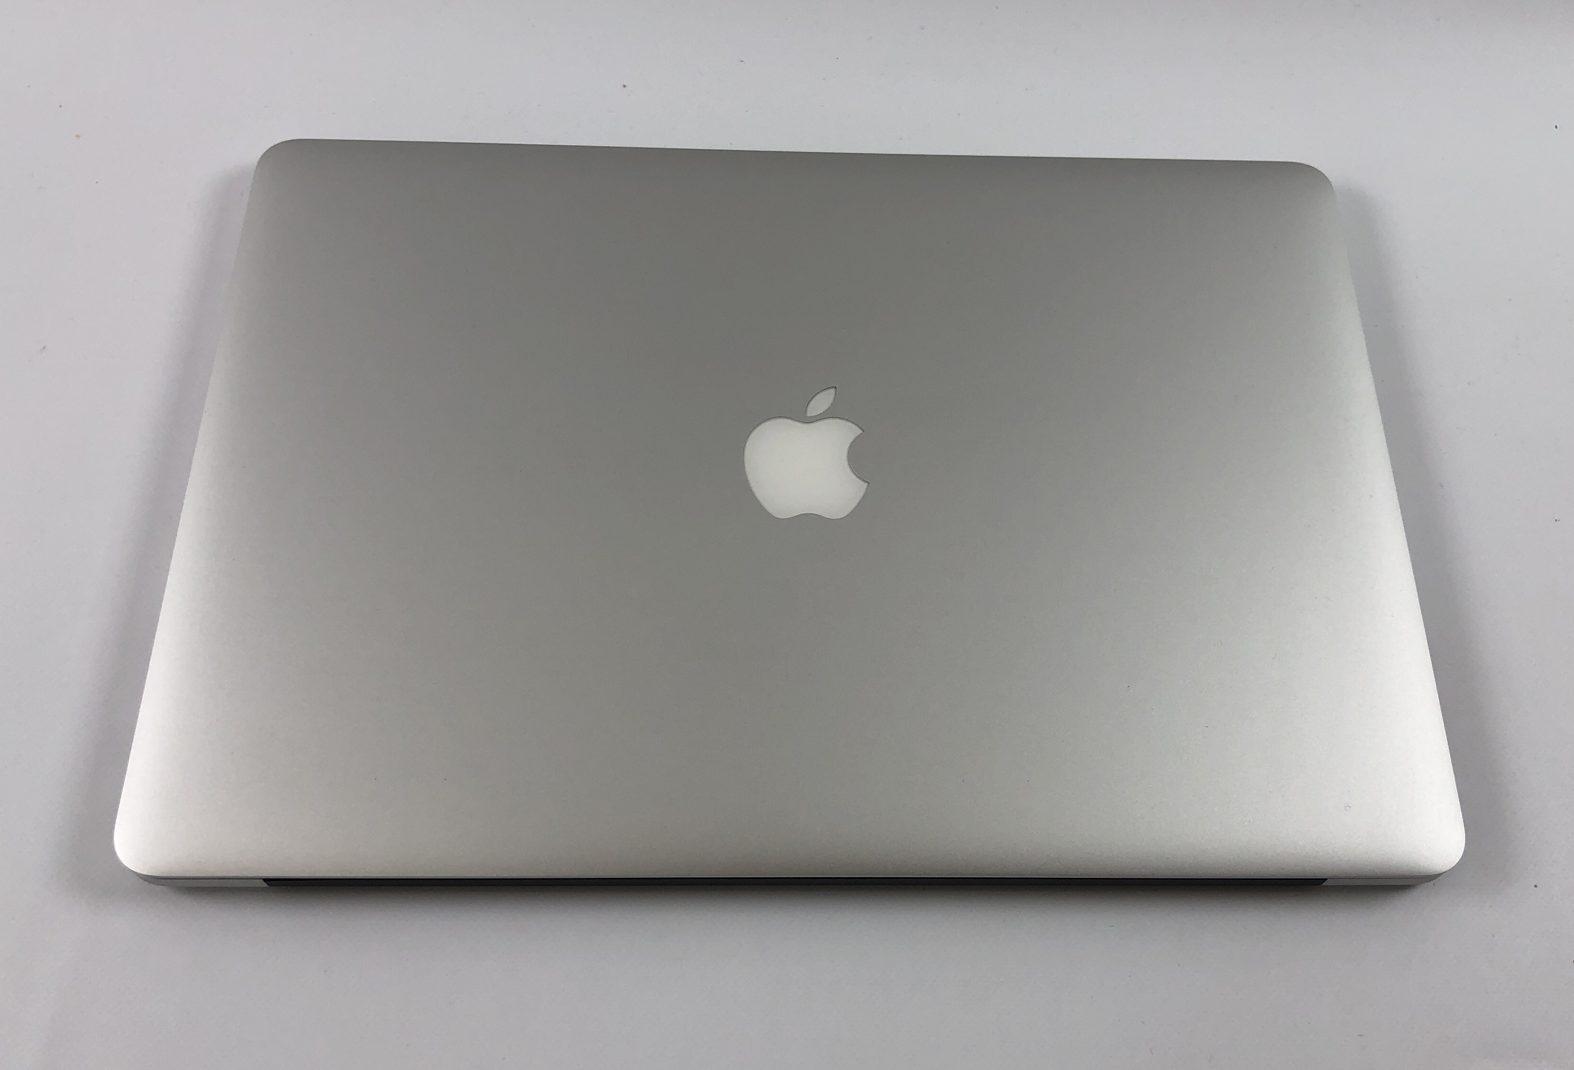 "MacBook Pro Retina 15"" Early 2013 (Intel Quad-Core i7 2.4 GHz 8 GB RAM 256 GB SSD), Intel Quad-Core i7 2.4 GHz, 8 GB RAM, 256 GB SSD, imagen 2"